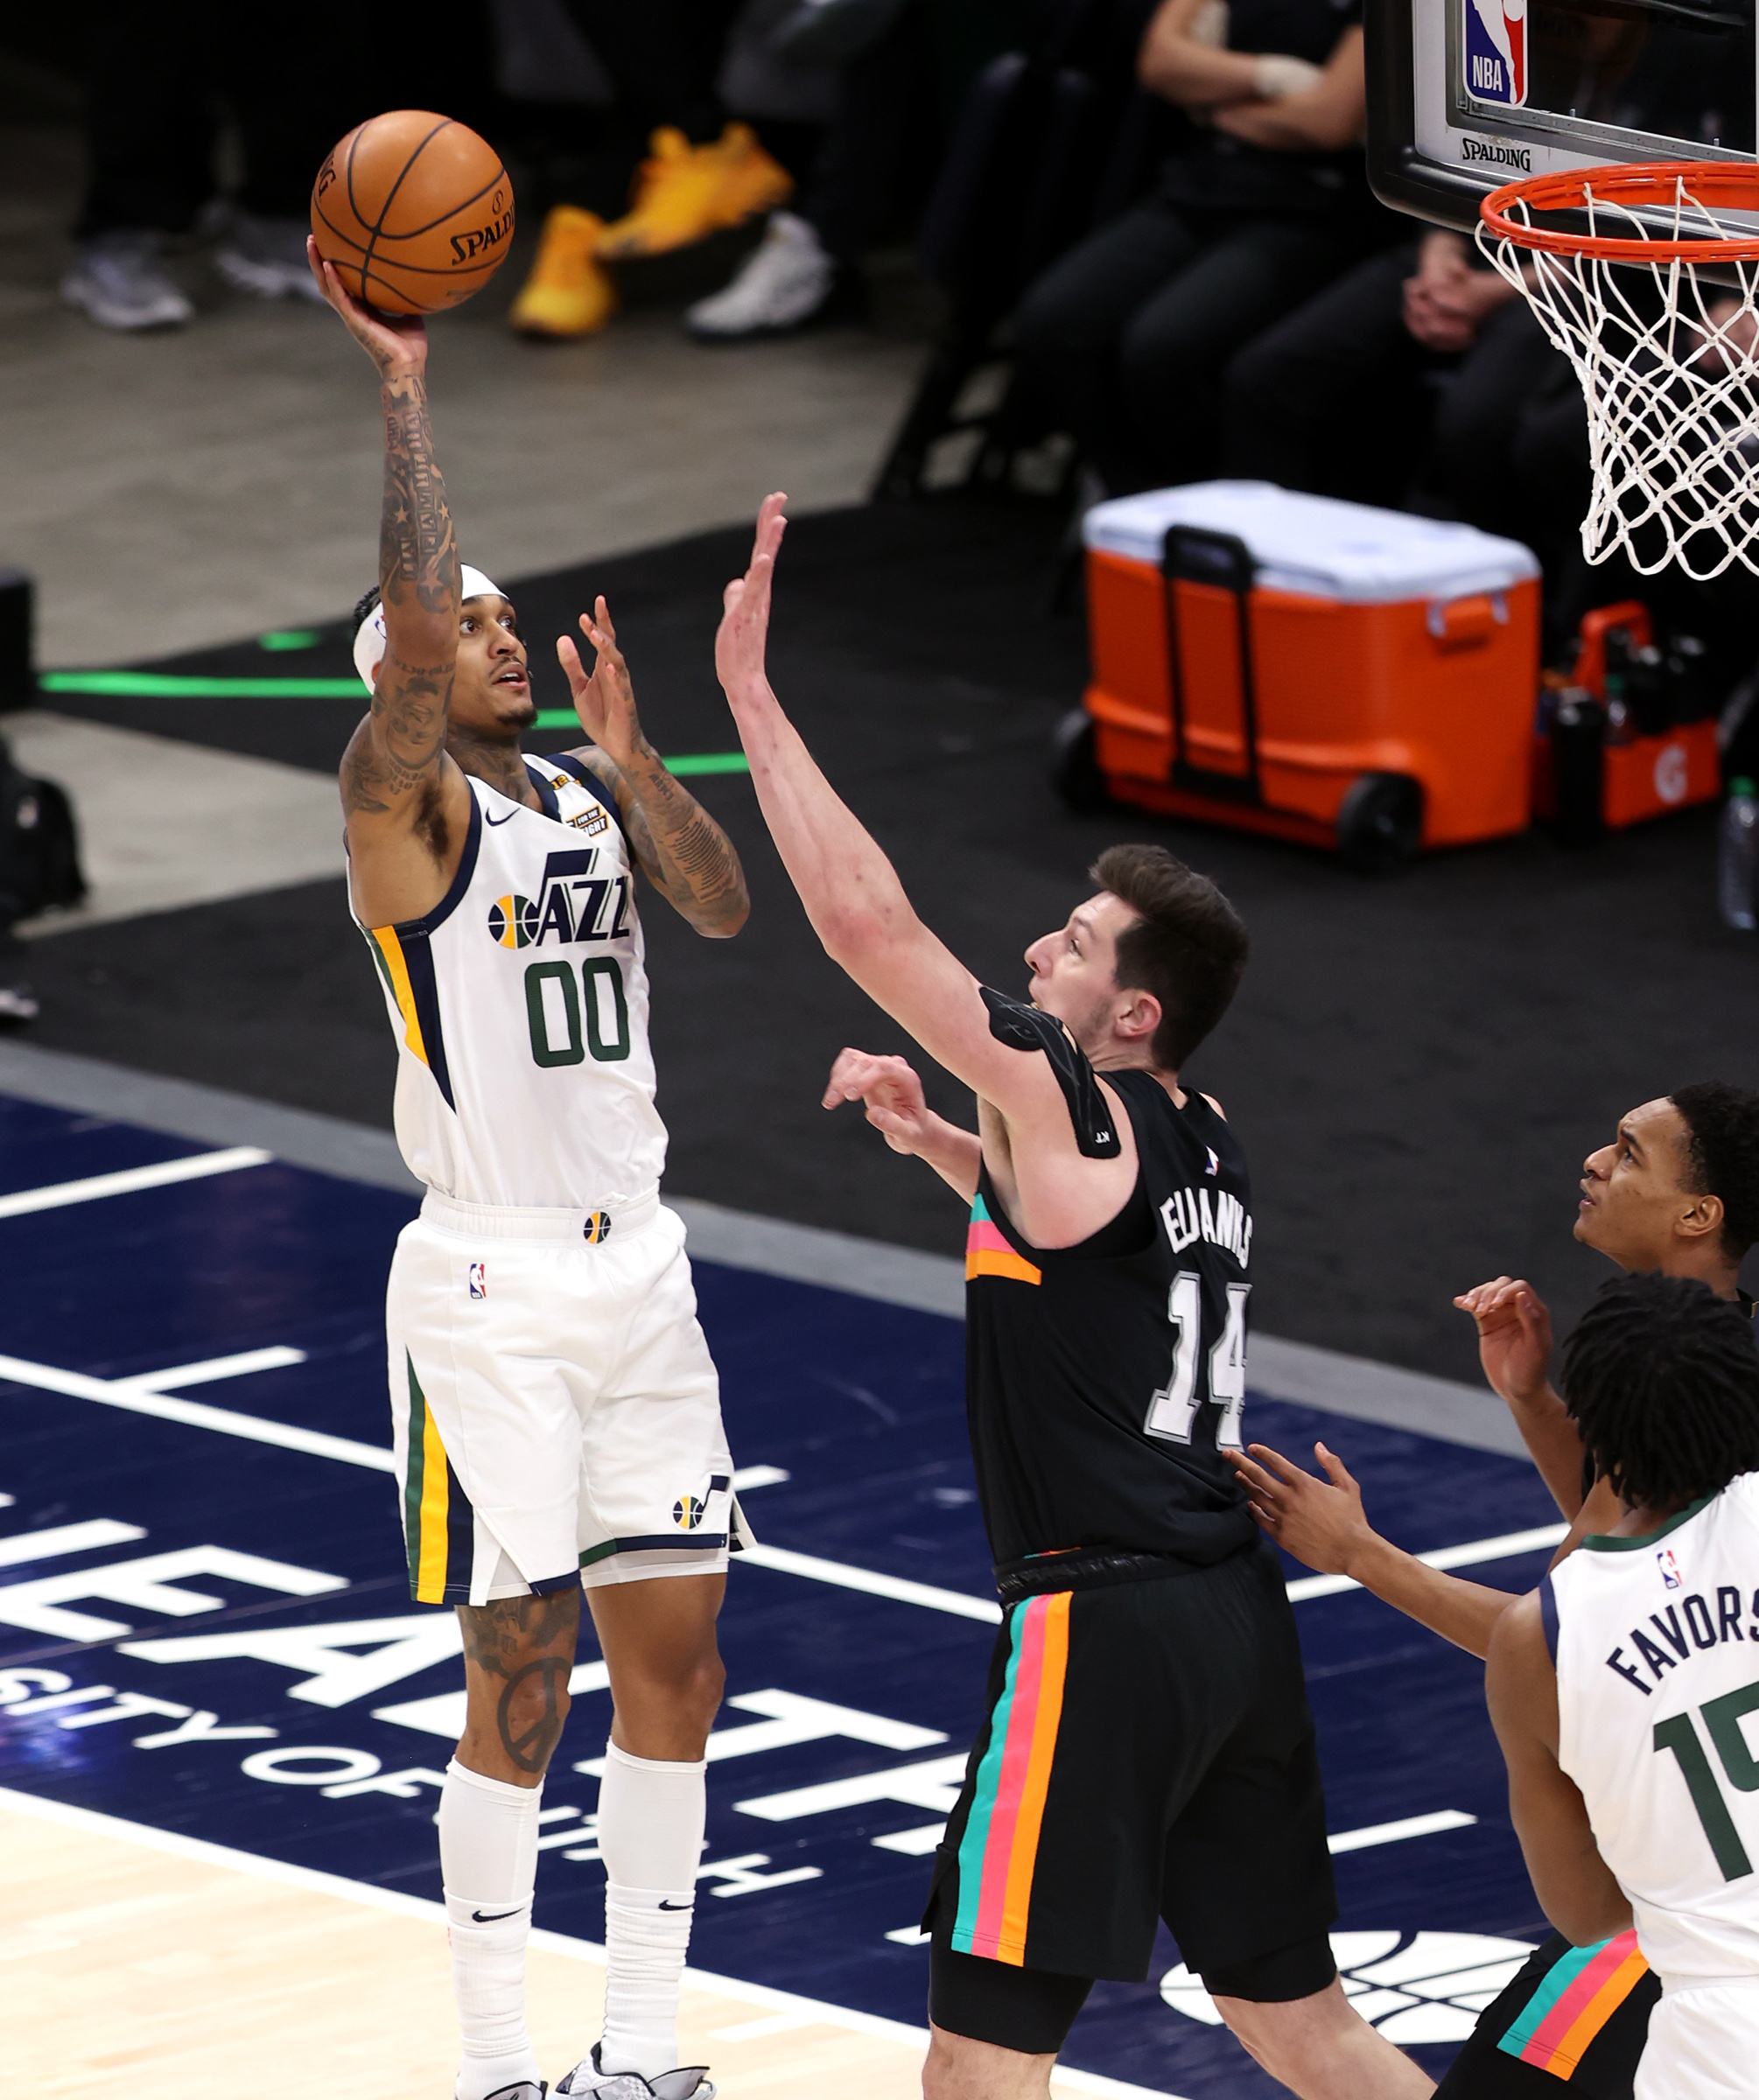 Utah Jazz guard Jordan Clarkson (00) pushes up a shot over San Antonio Spurs forward Drew Eubanks (14) as the Utah Jazz and the San Antonio Spurs play an NBA basketball game at Vivint Arena in Salt Lake City on Wednesday, May 5, 2021.